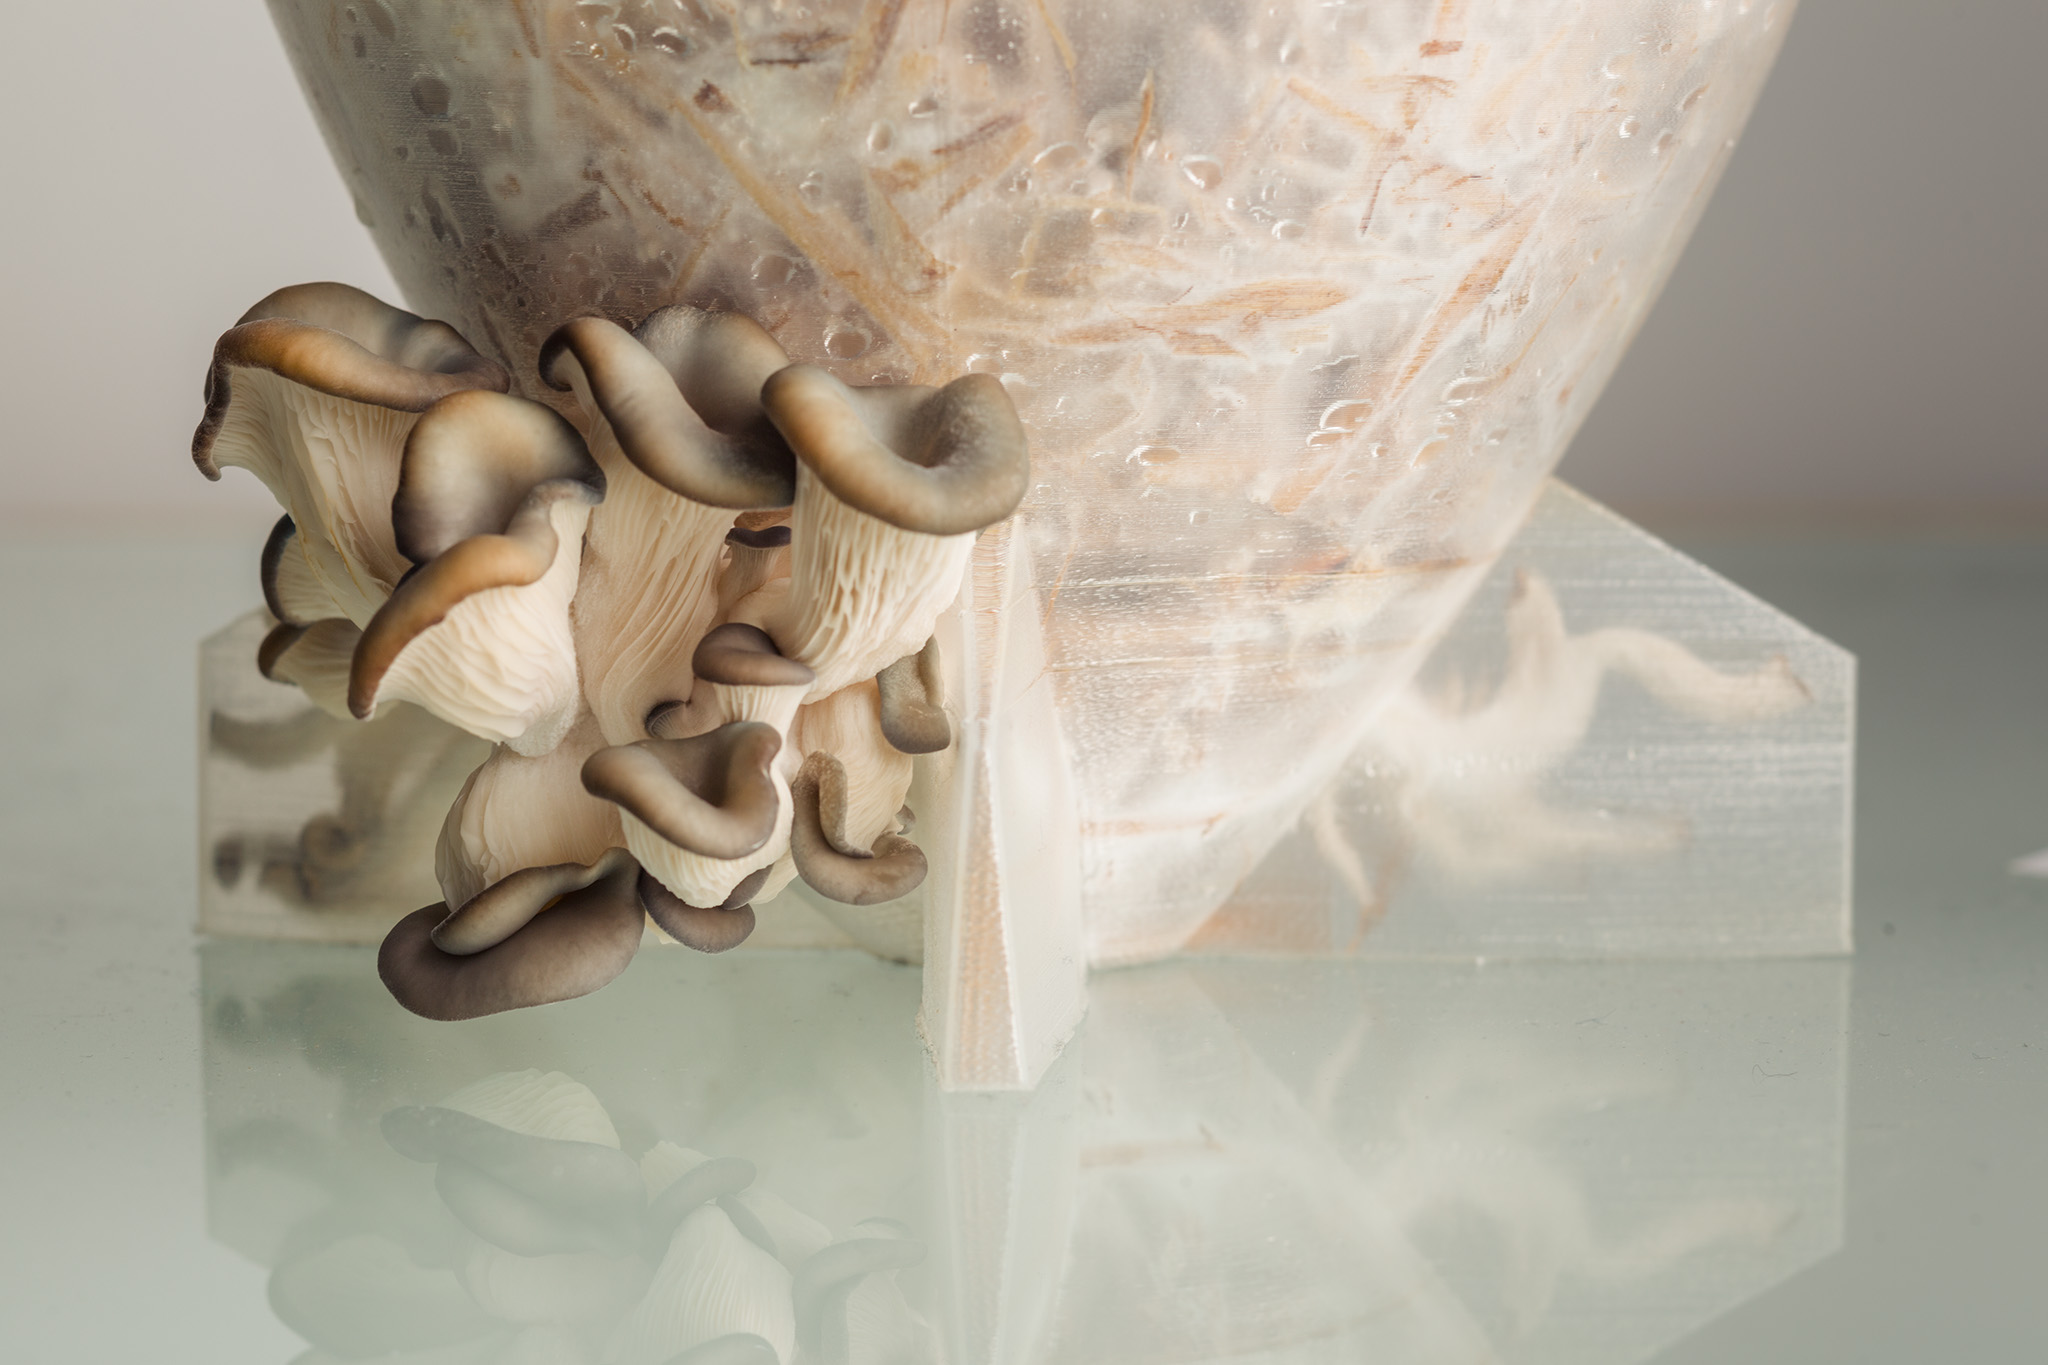 Third mushroom mold